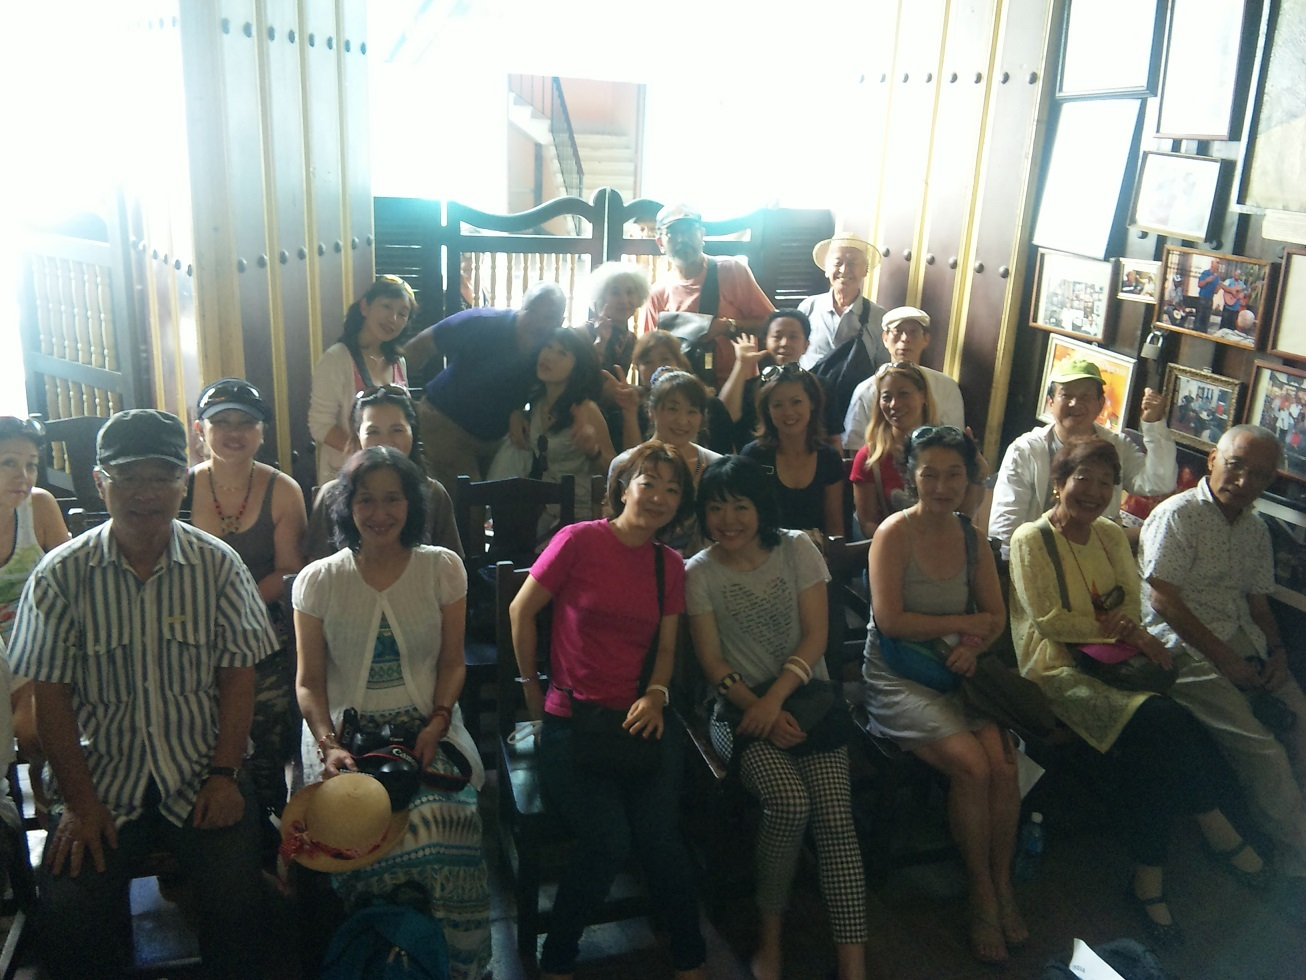 blog;2016年3月のキューバ・ツアー・チラシ・データです #キューバ #ツアー #カリブ海 #国際音楽祭_a0103940_13545800.jpg